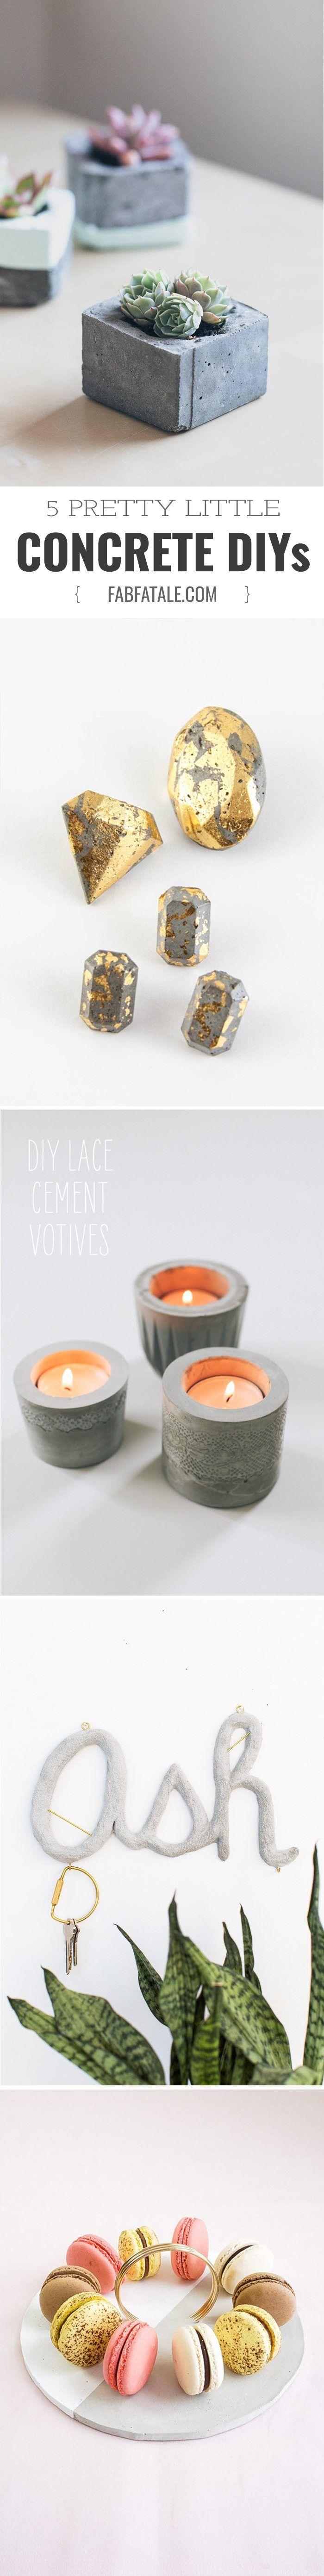 5 pretty little concrete diy crafts - cement votive, tray, gold jewelry, planter